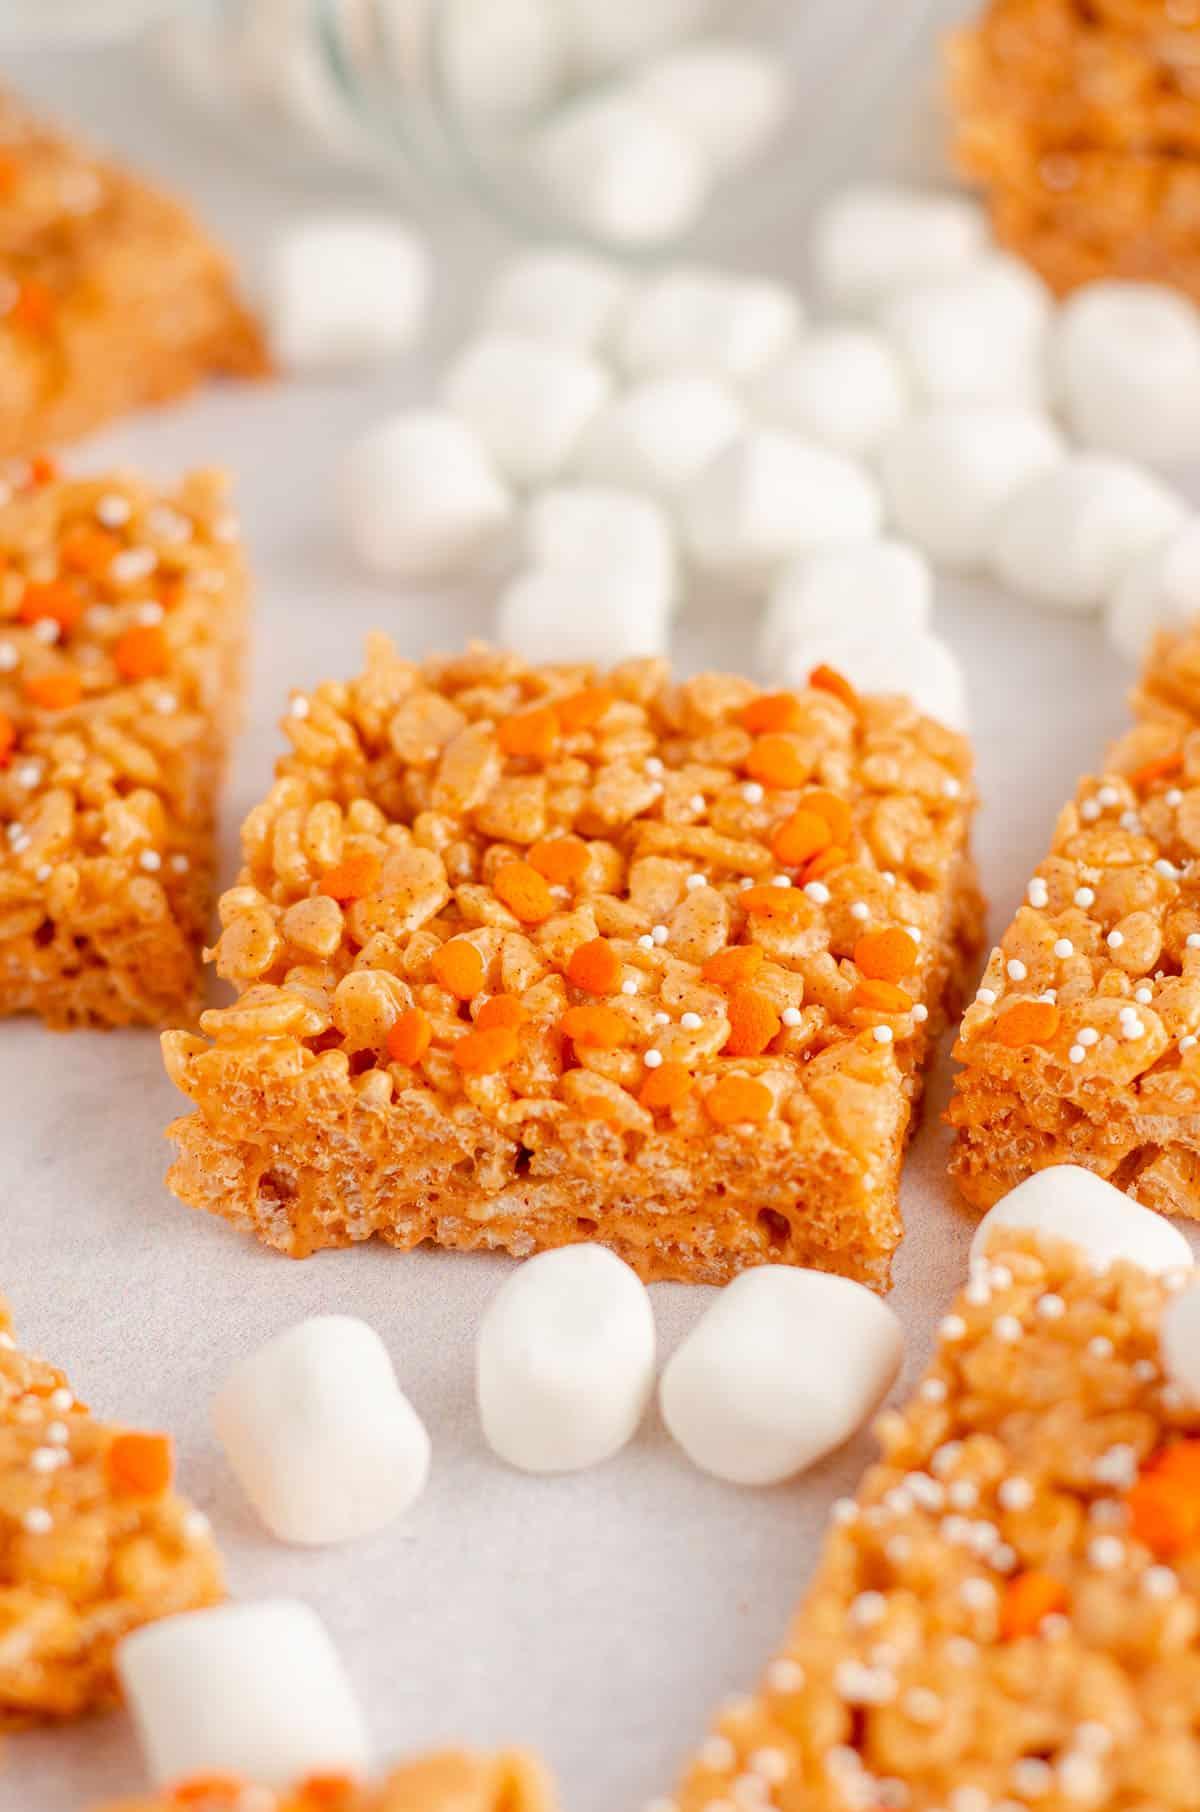 pumpkin rice krispies treats surrounded by mini-marshmallows